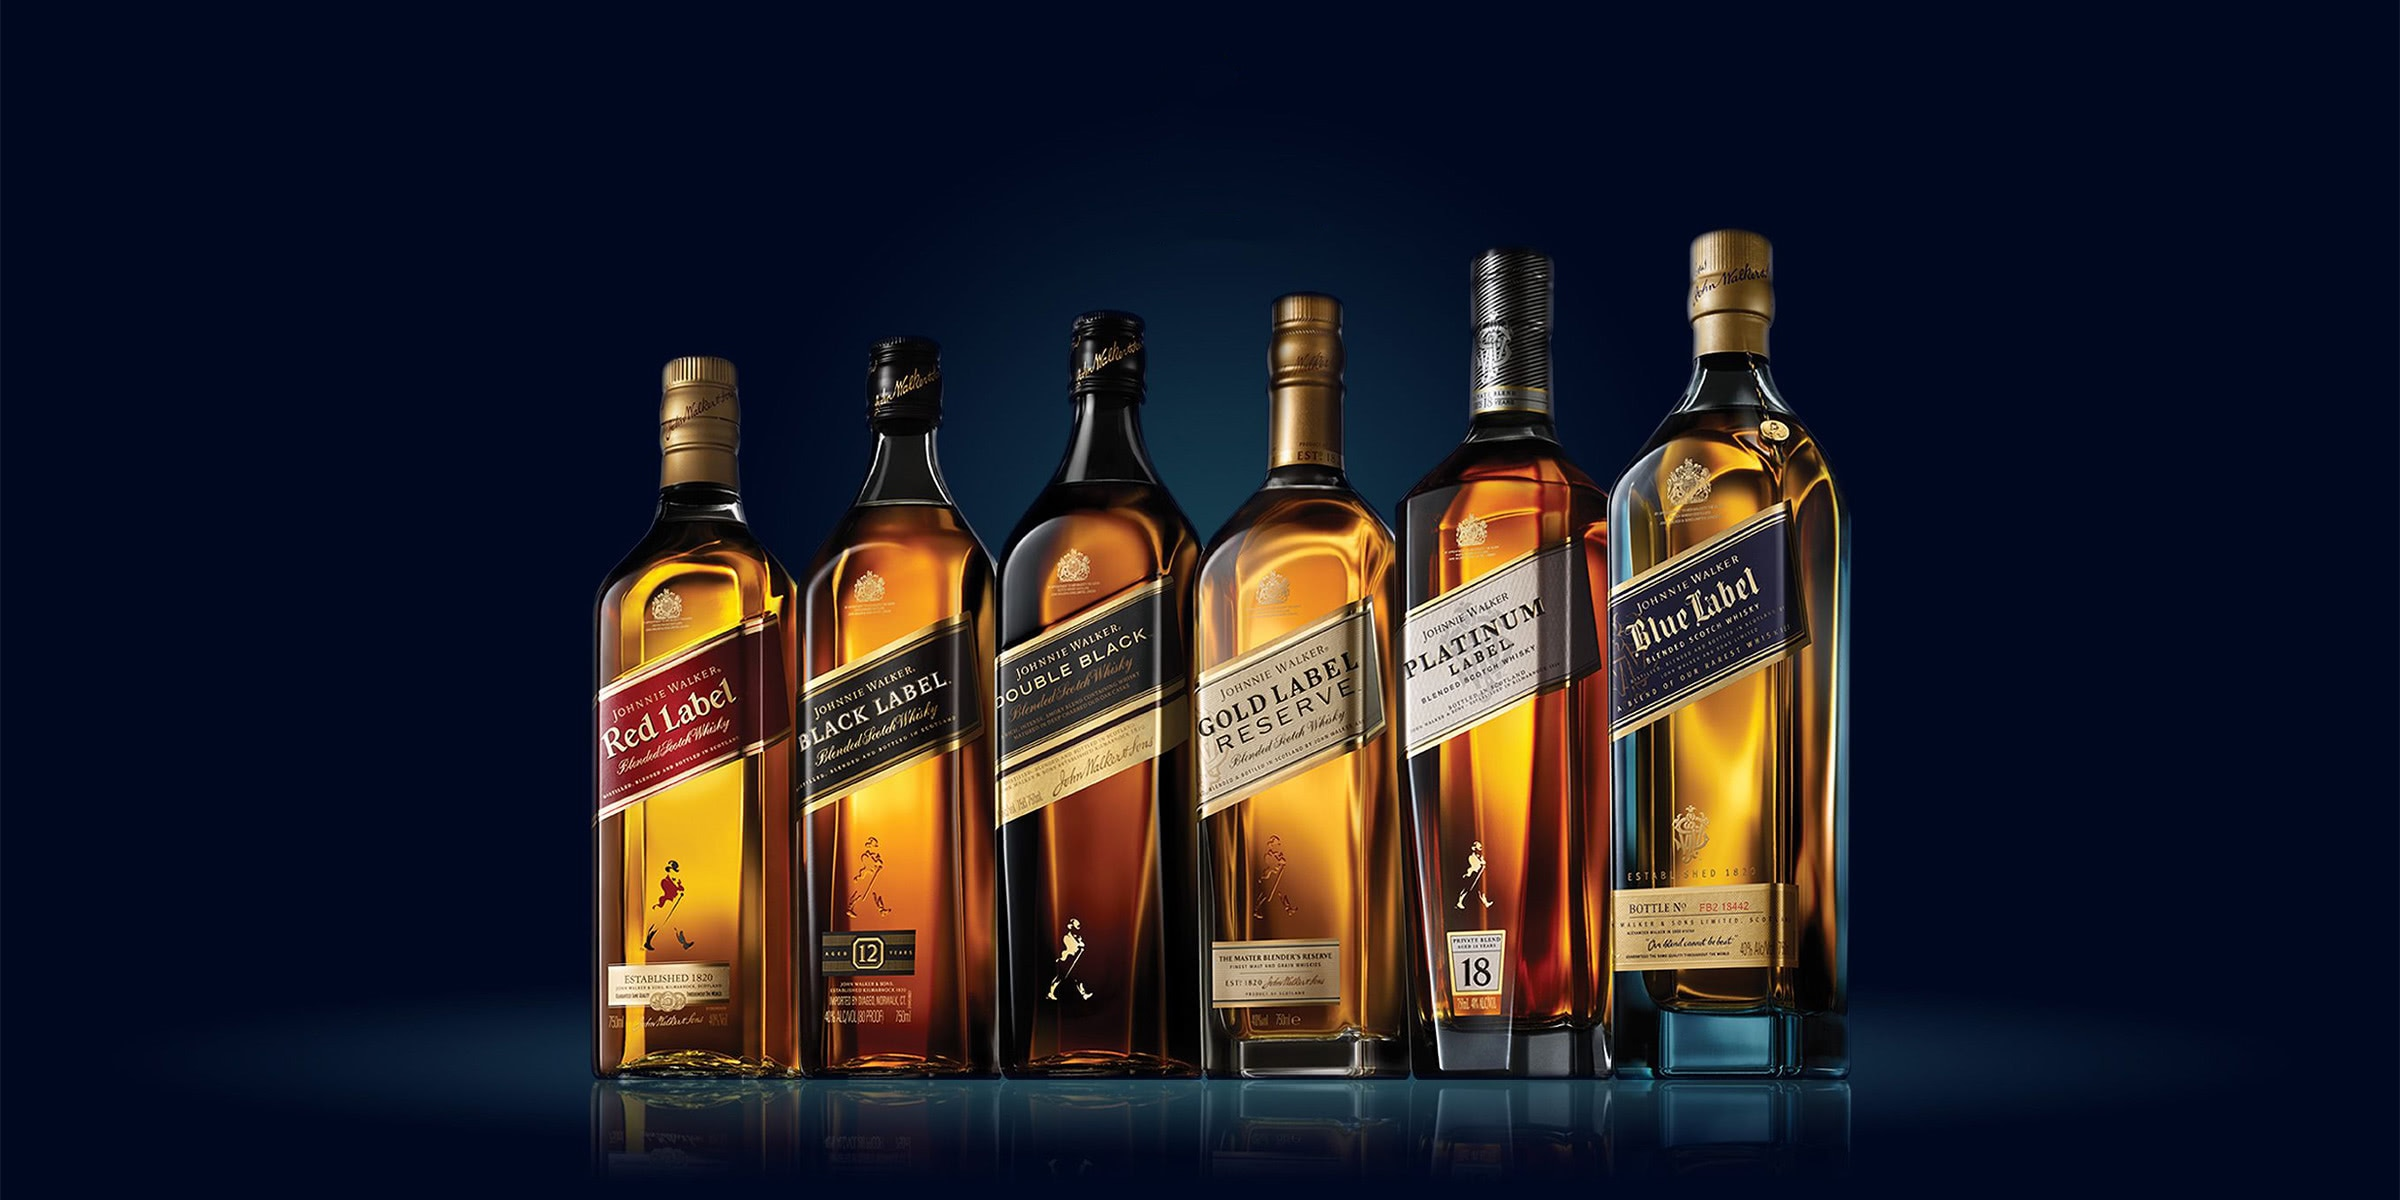 johnnie walker luxury whiskey - Luxe Digital